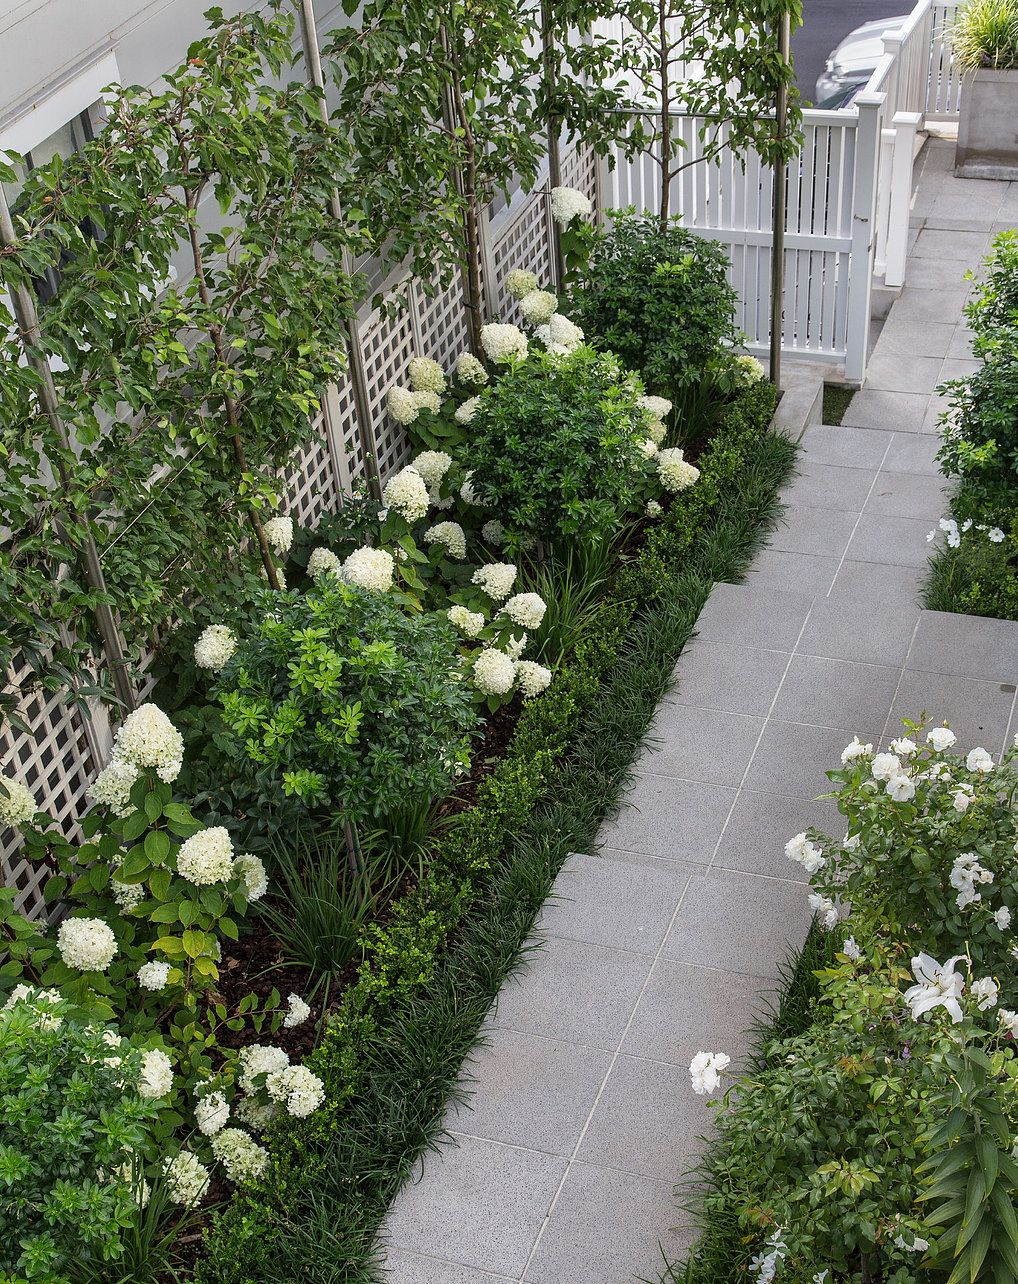 Ornamental Pleached Pears White Hydrangea Limelight Tinakori Hedge Garden Design Nur Courtyard Gardens Design Small Courtyard Gardens Front Garden Design